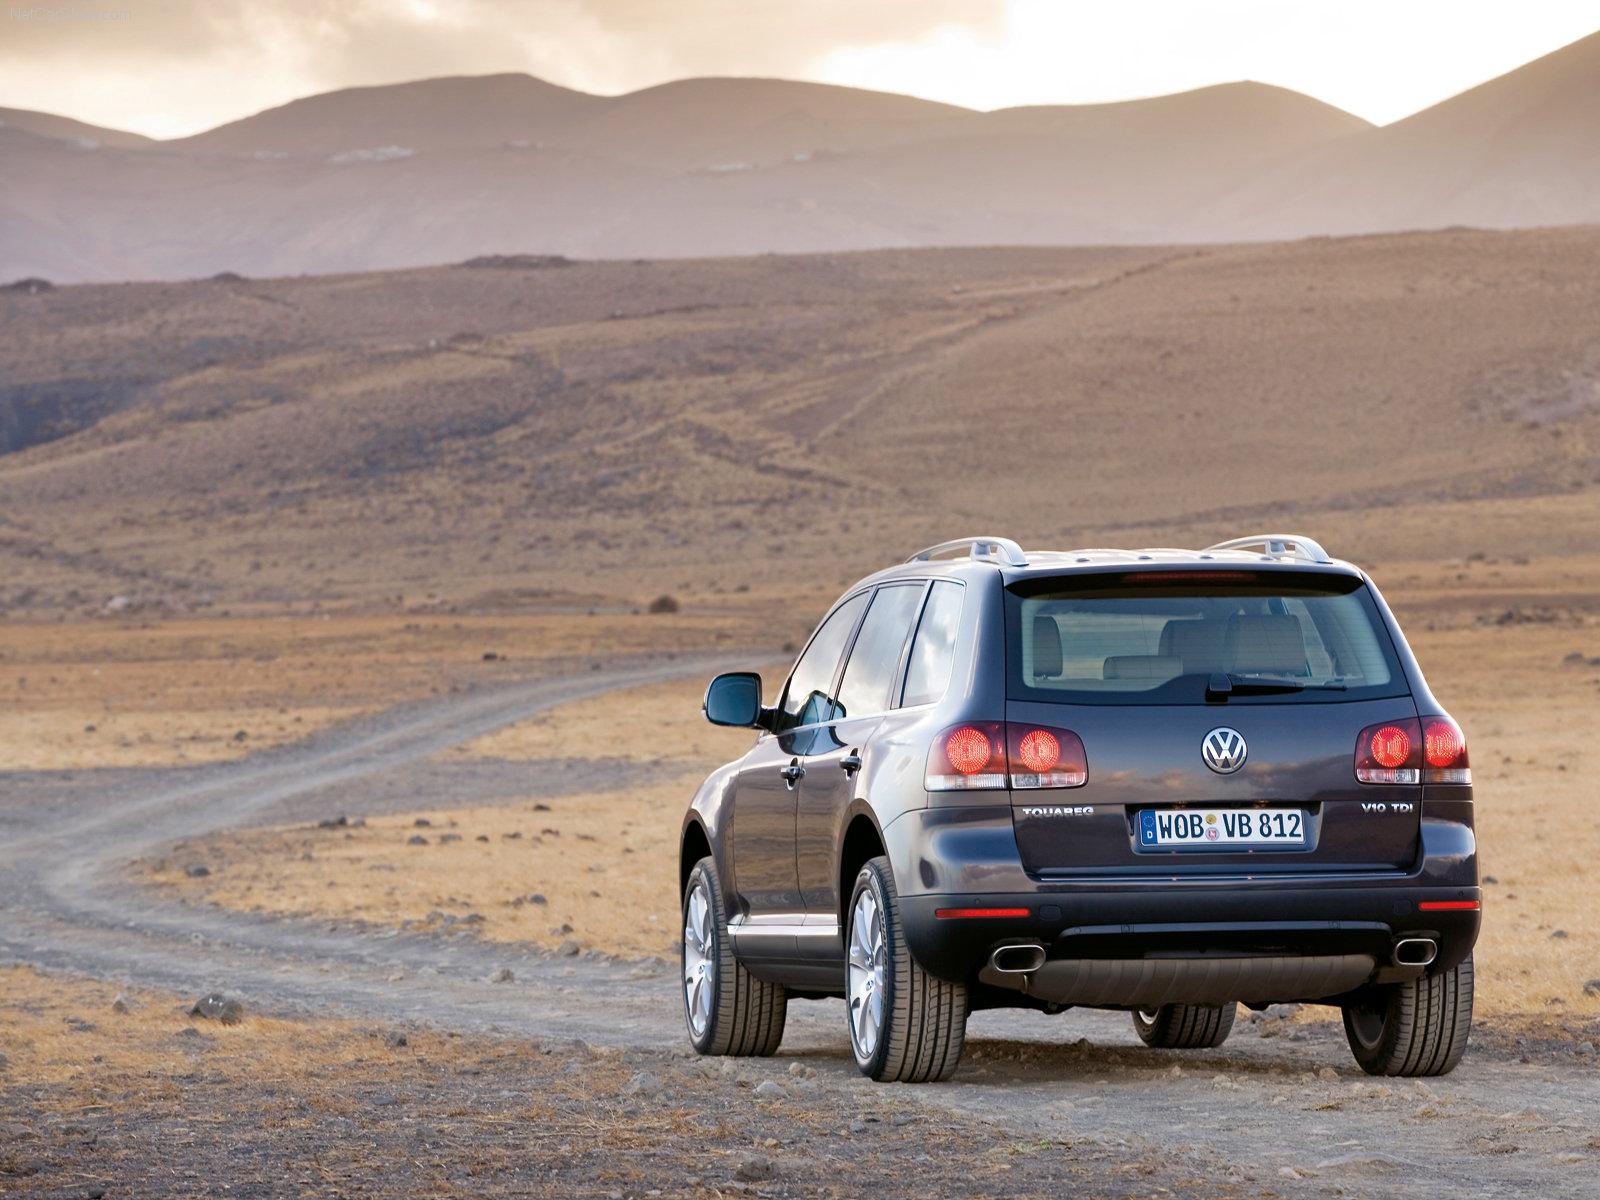 http://w04.ru/foto/Volkswagen-Touareg_2007_1600x1200_wallpaper_17.jpg